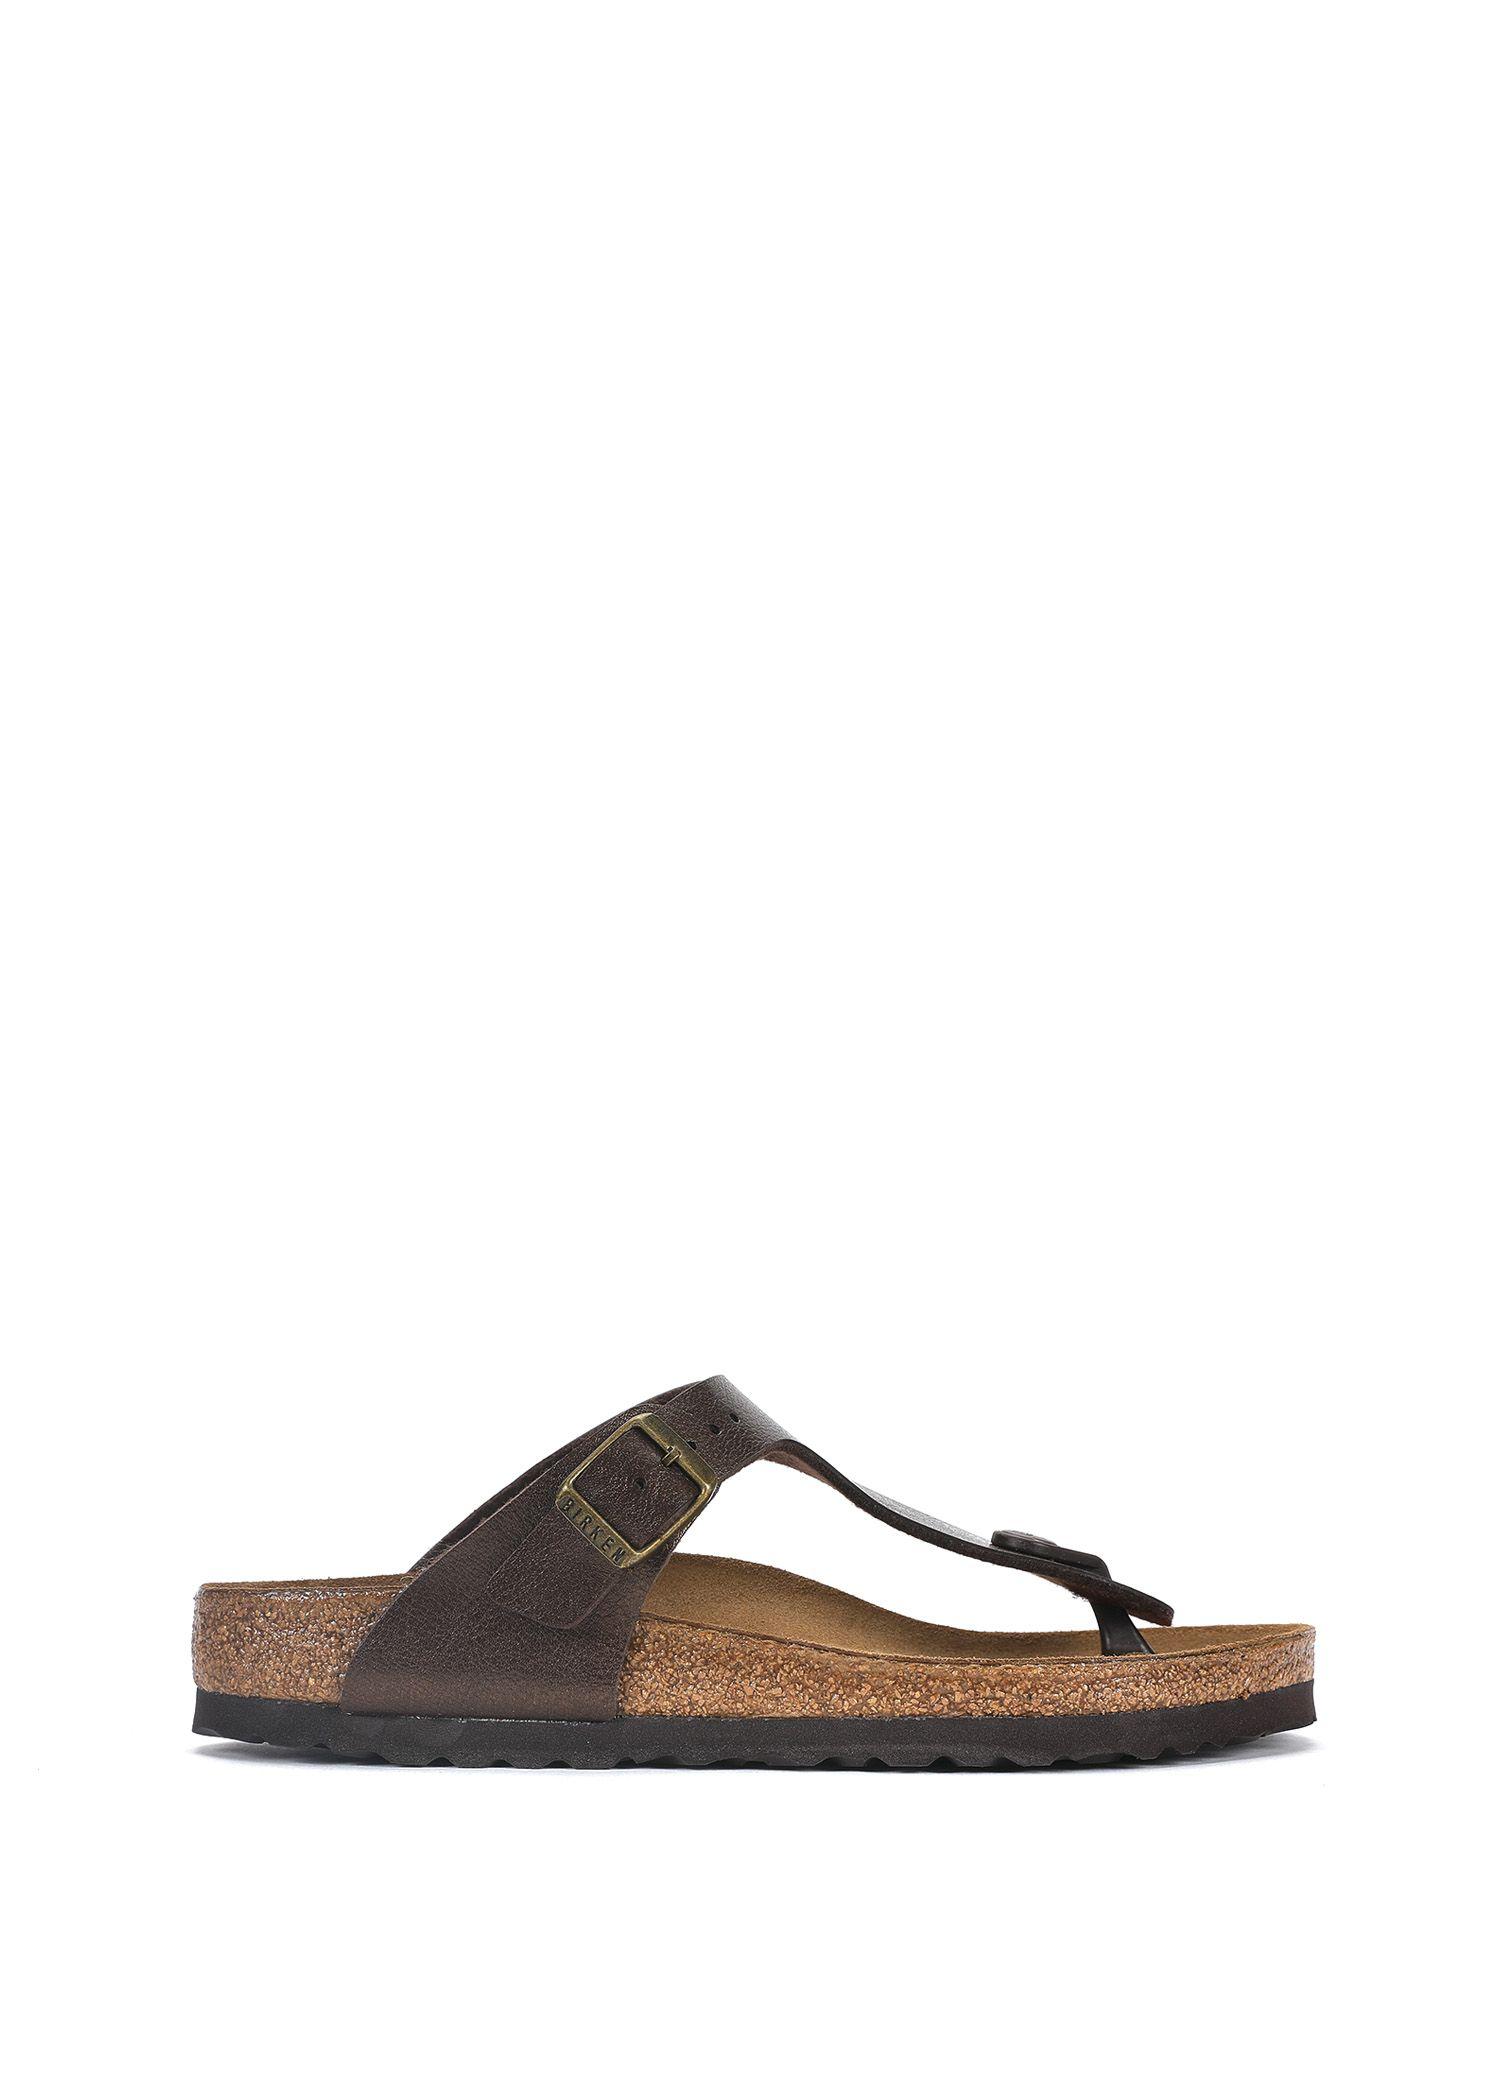 2f7cf92e41d BIRKENSTOCK GIZEH BIRKO-FLOR.  birkenstock  shoes